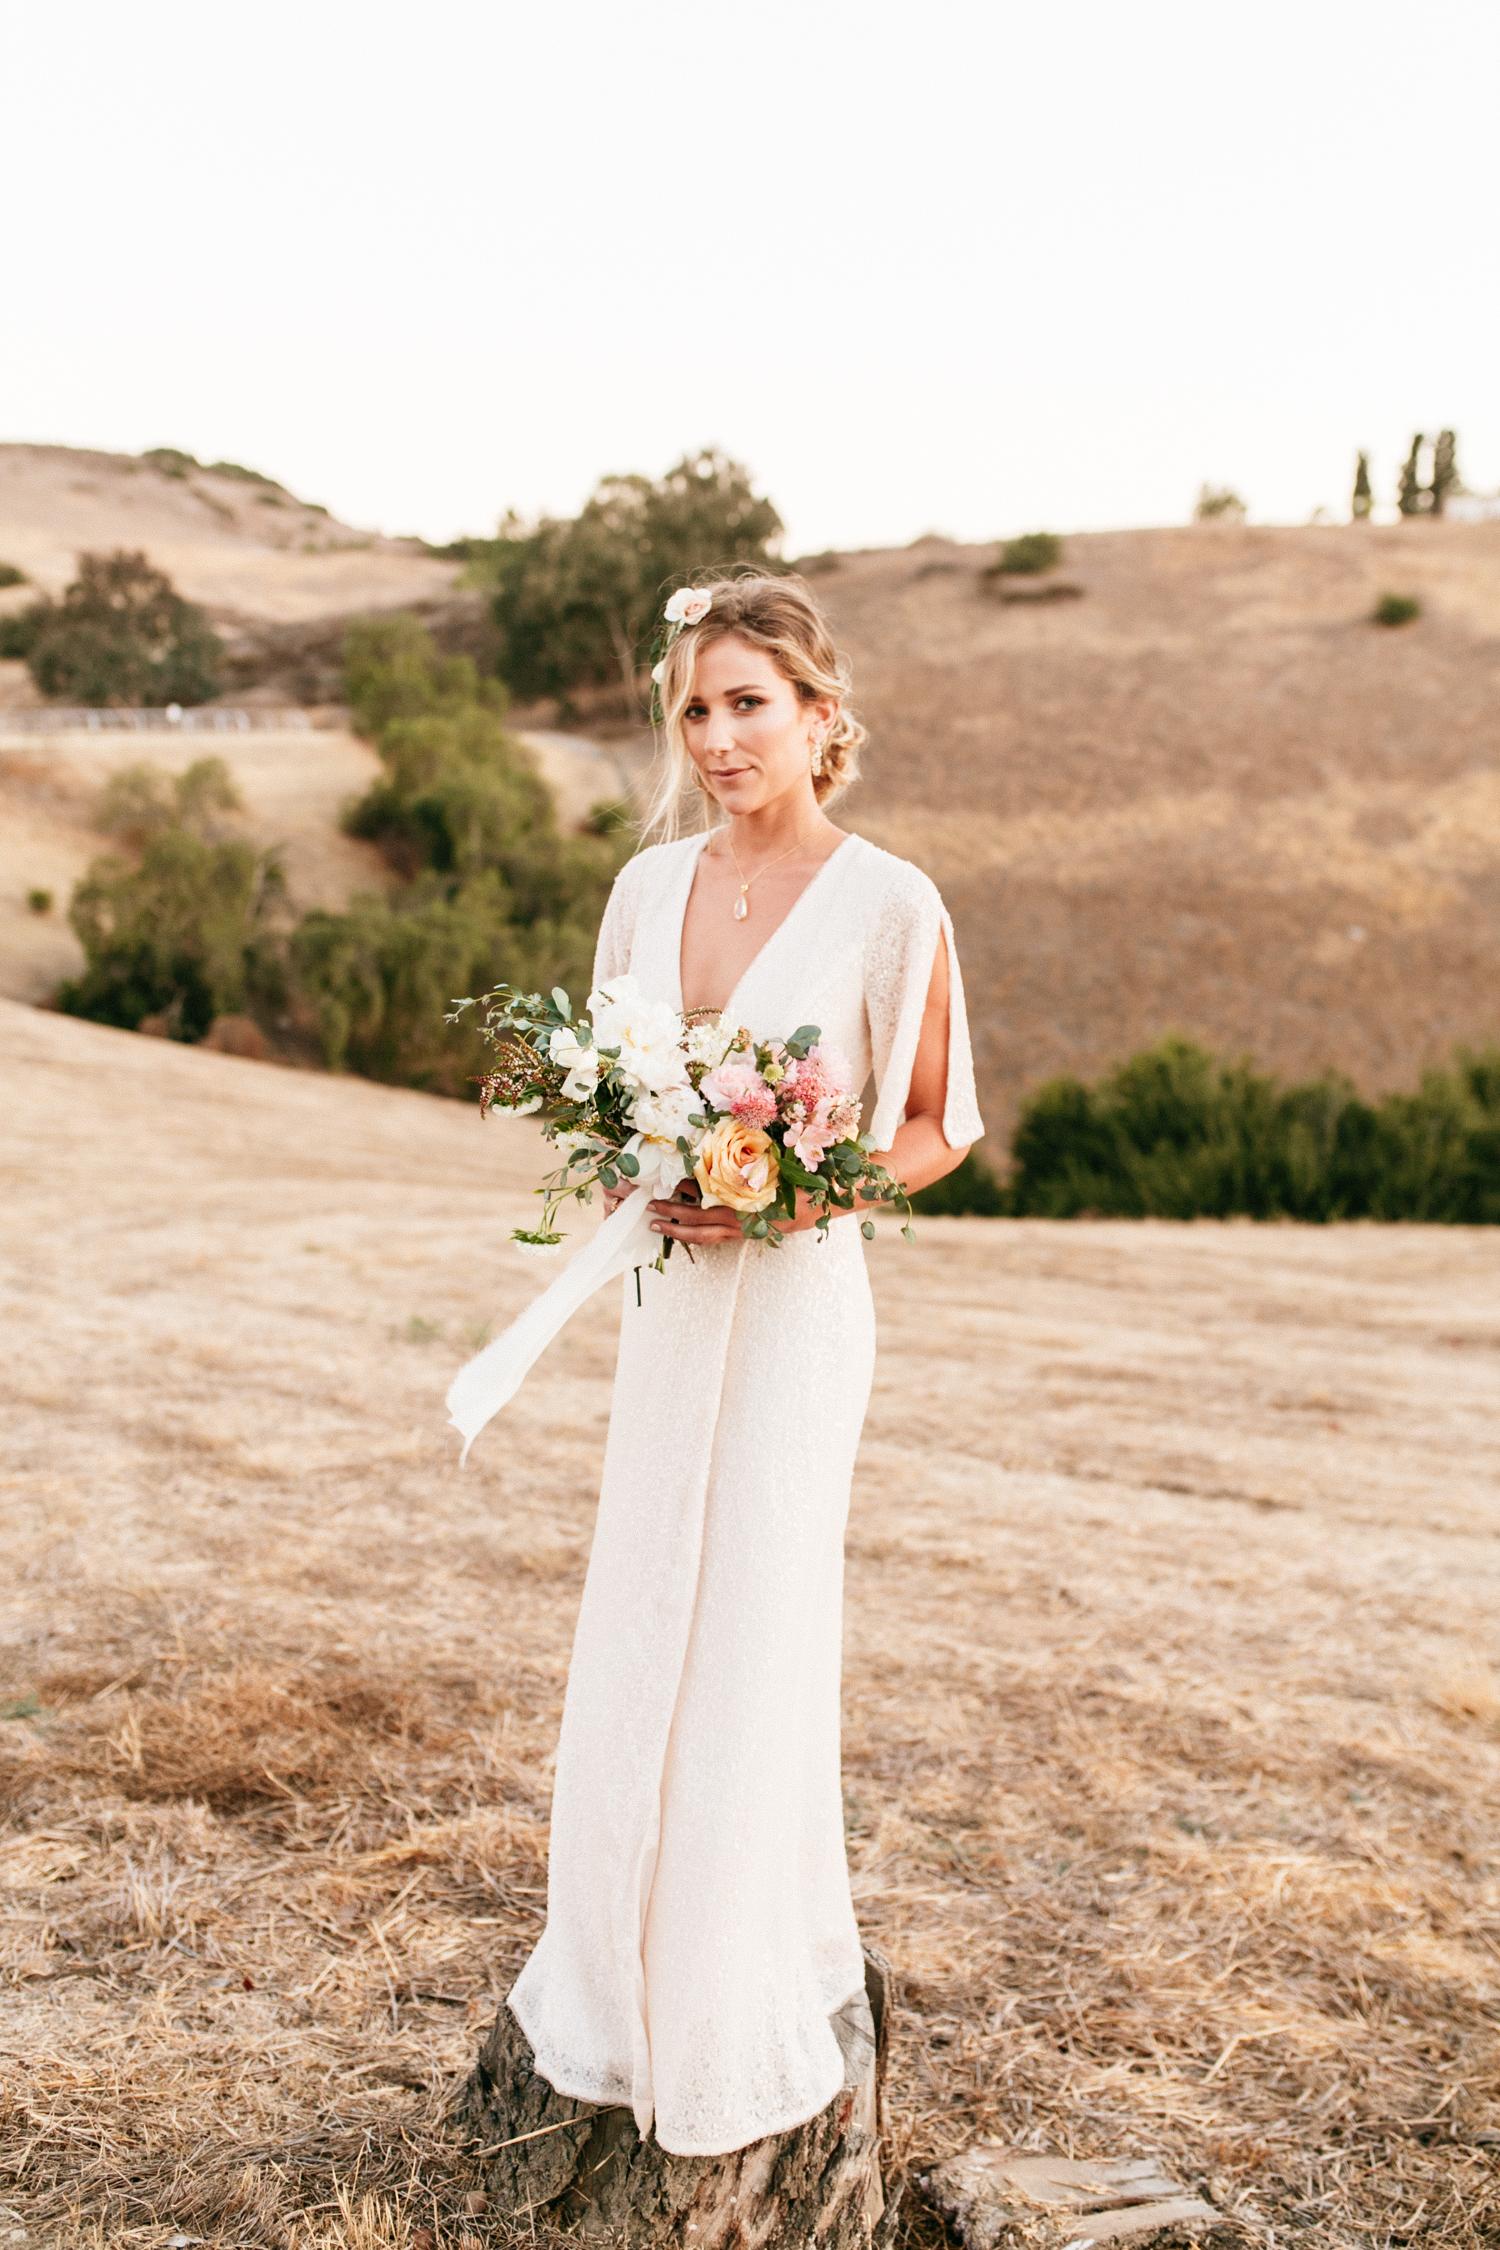 SamErica Studios - modern boho bride portrait - wedding floral crown - san diego wedding photographer